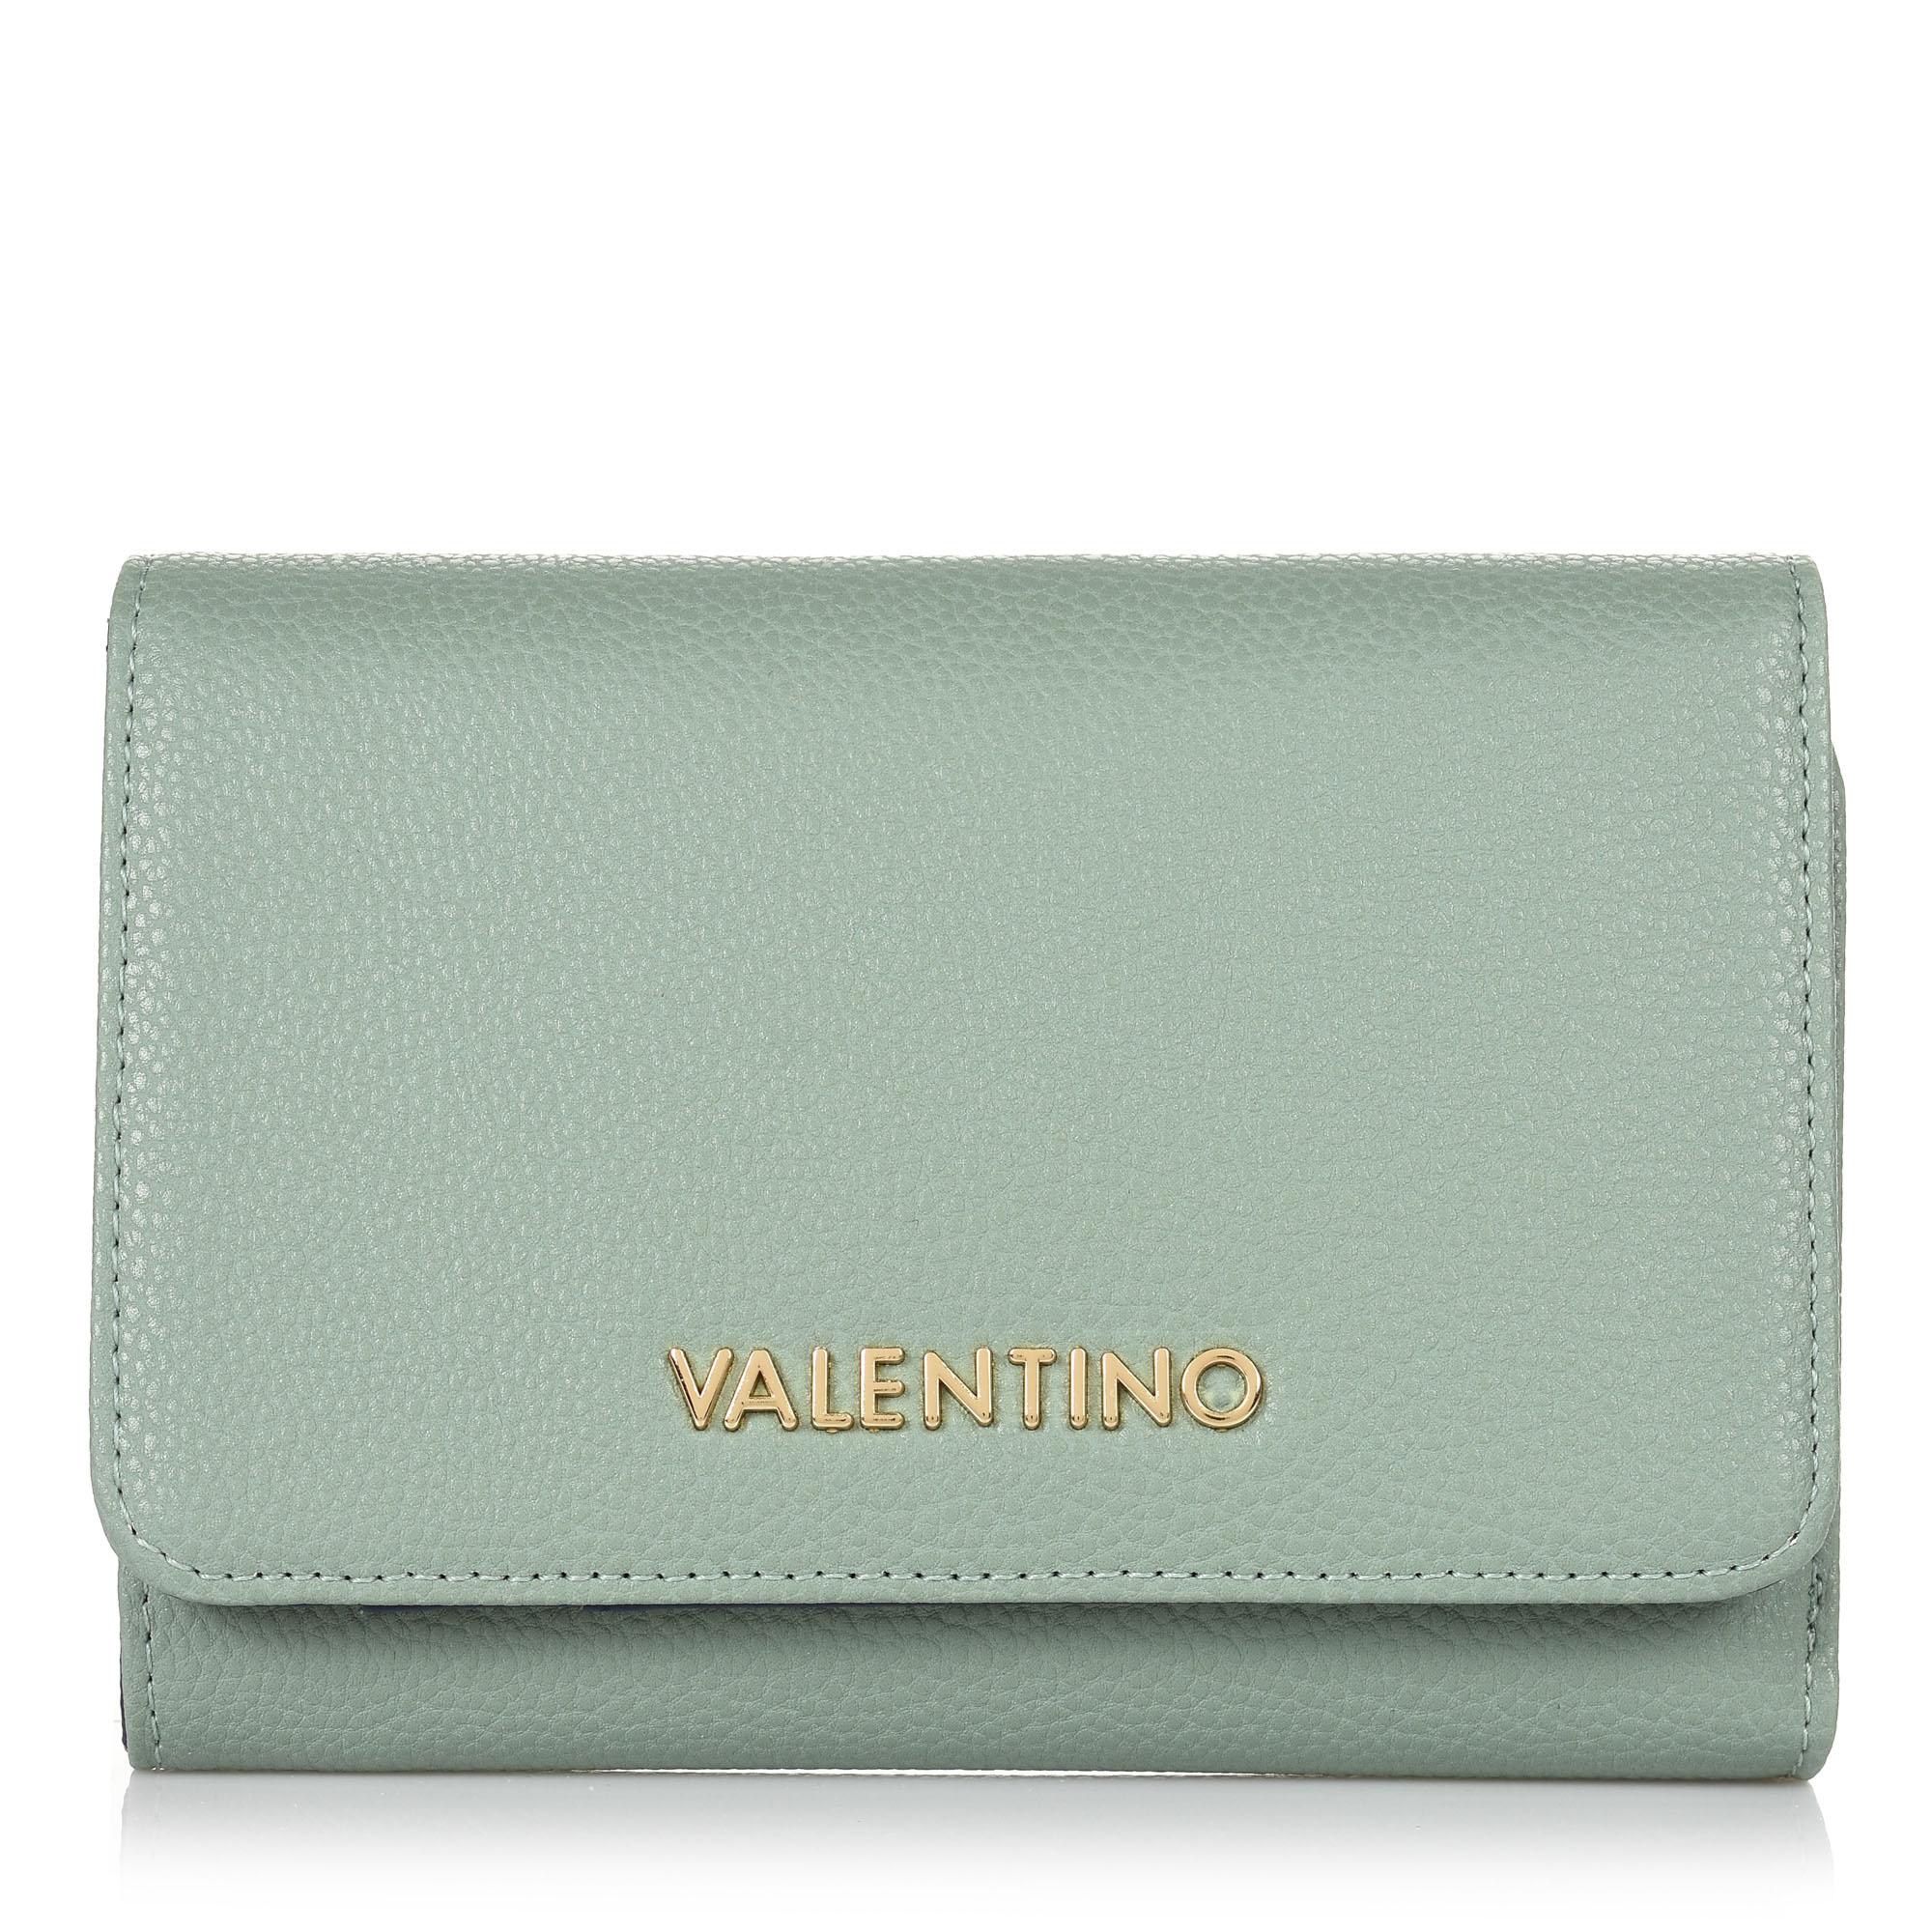 09d7681c45 Πορτοφόλι Valentino VPS30143